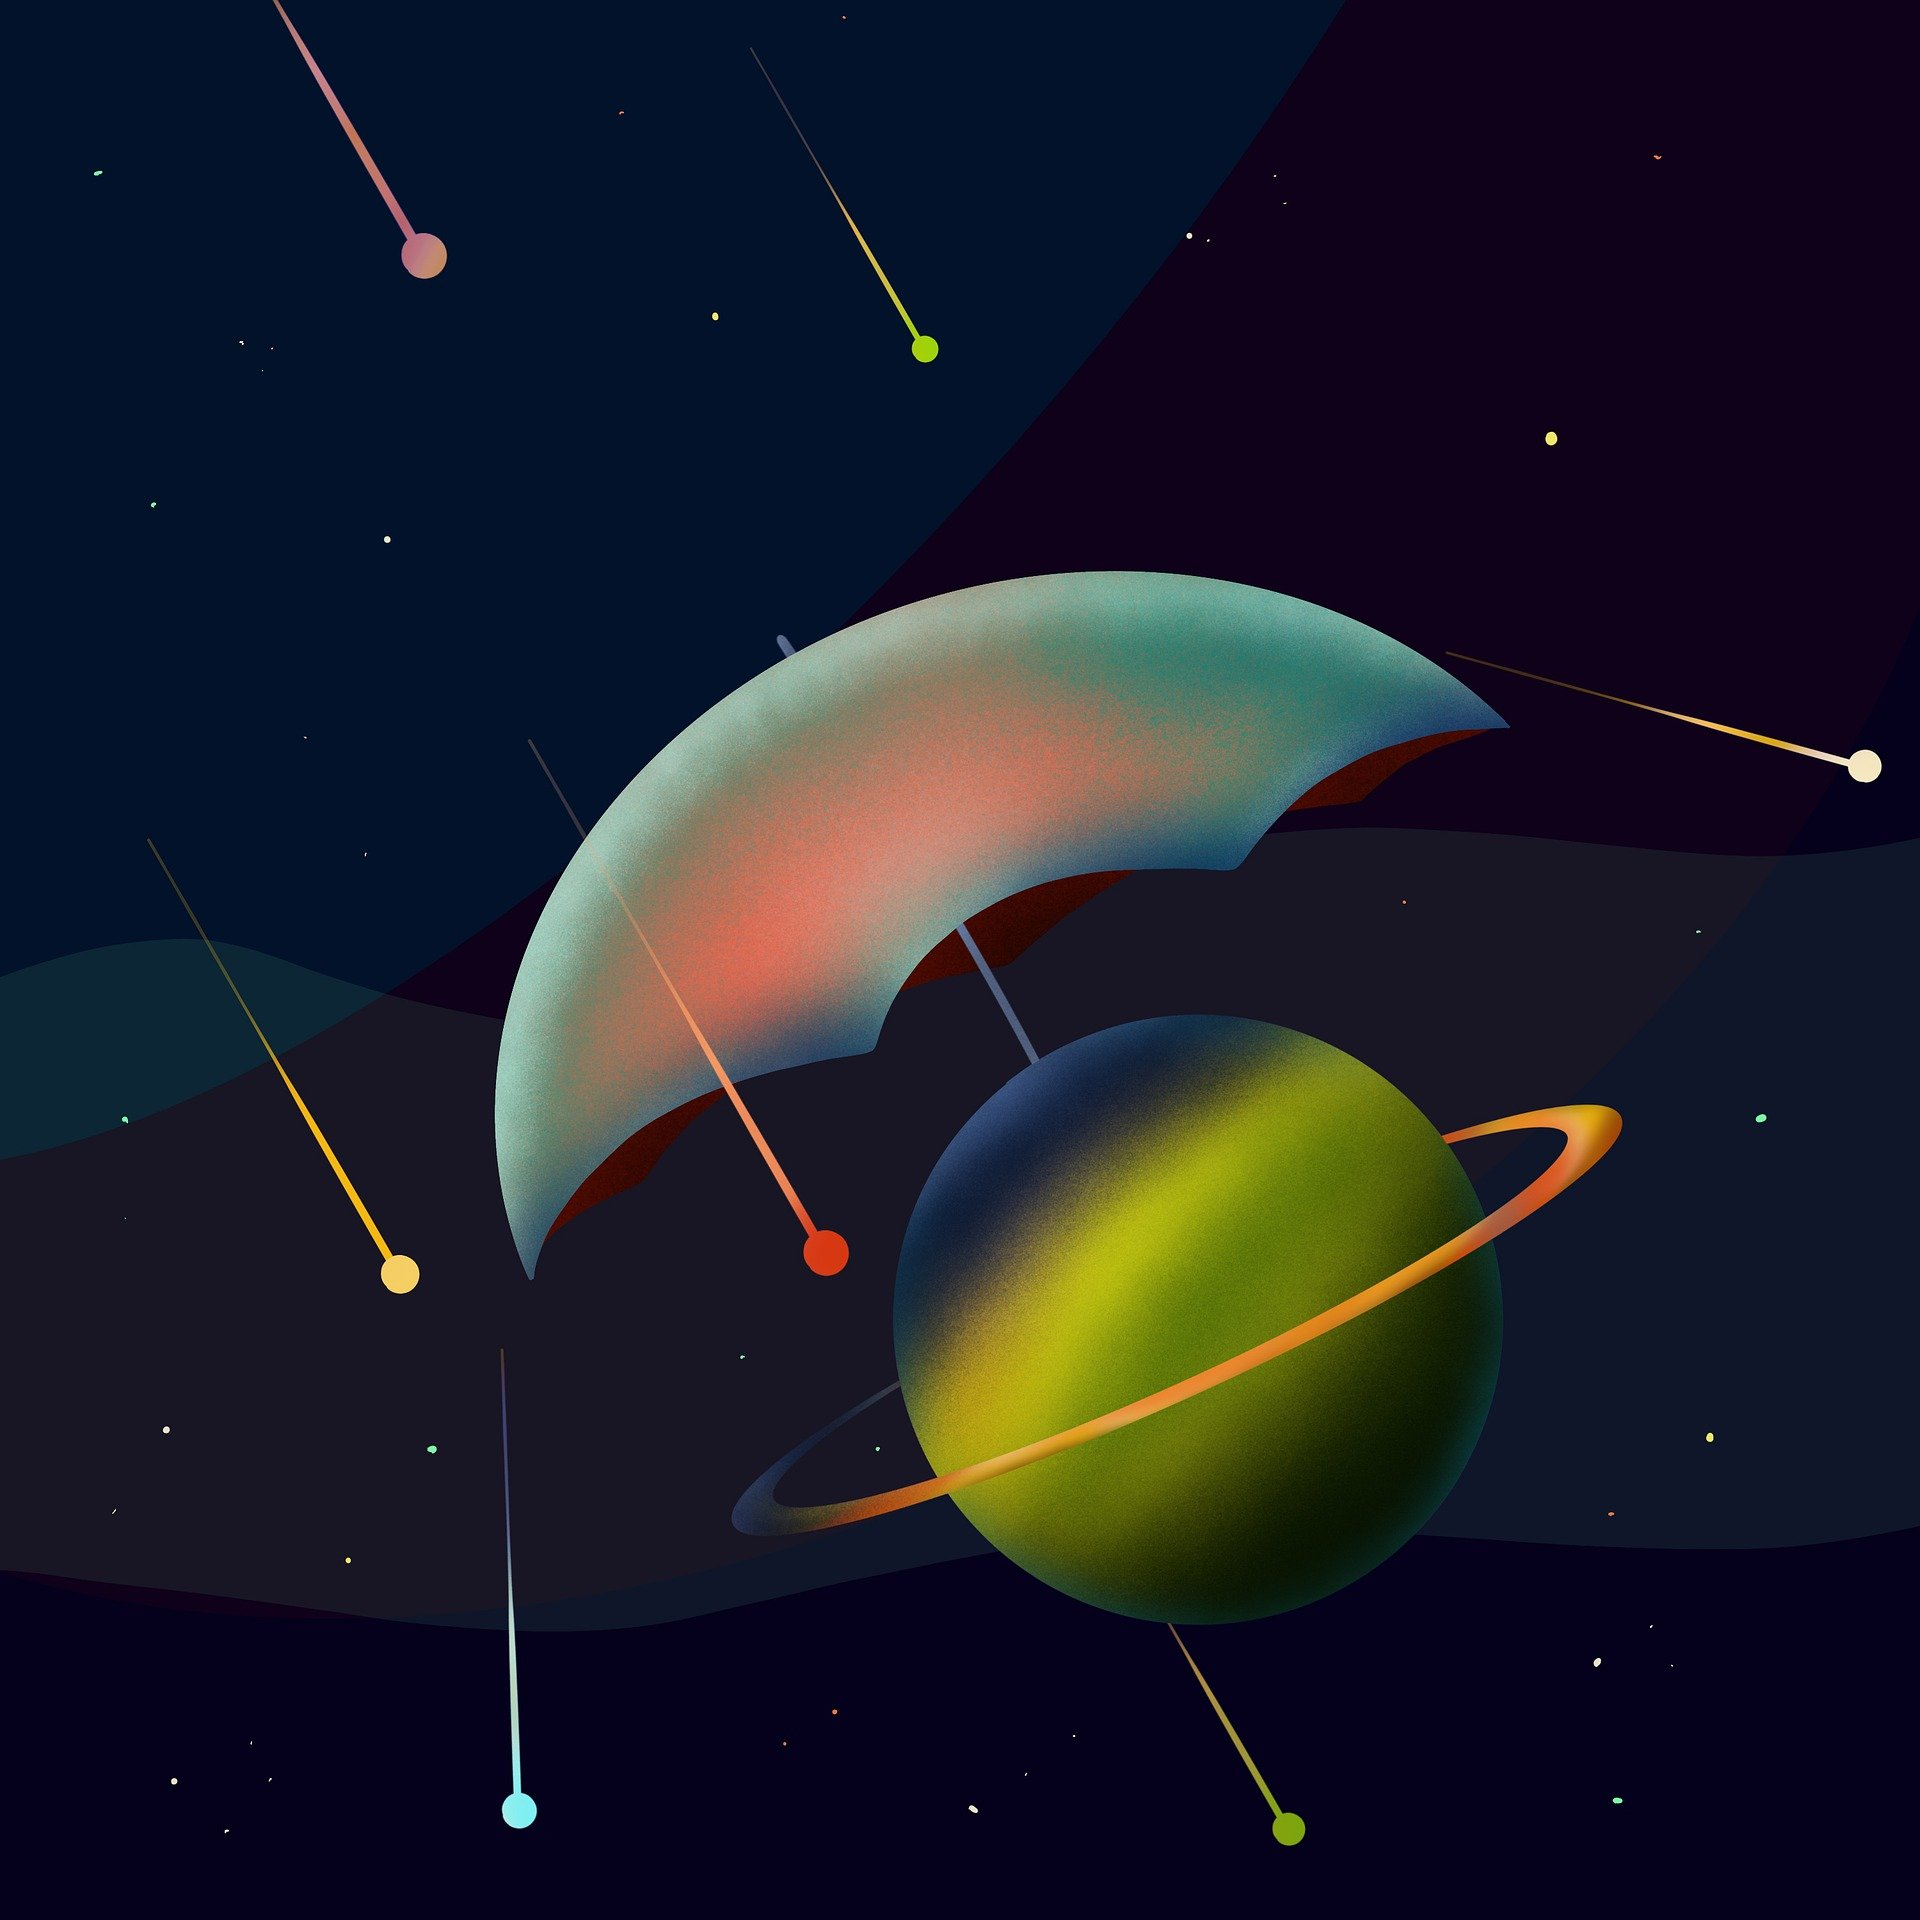 Umbrella with planet